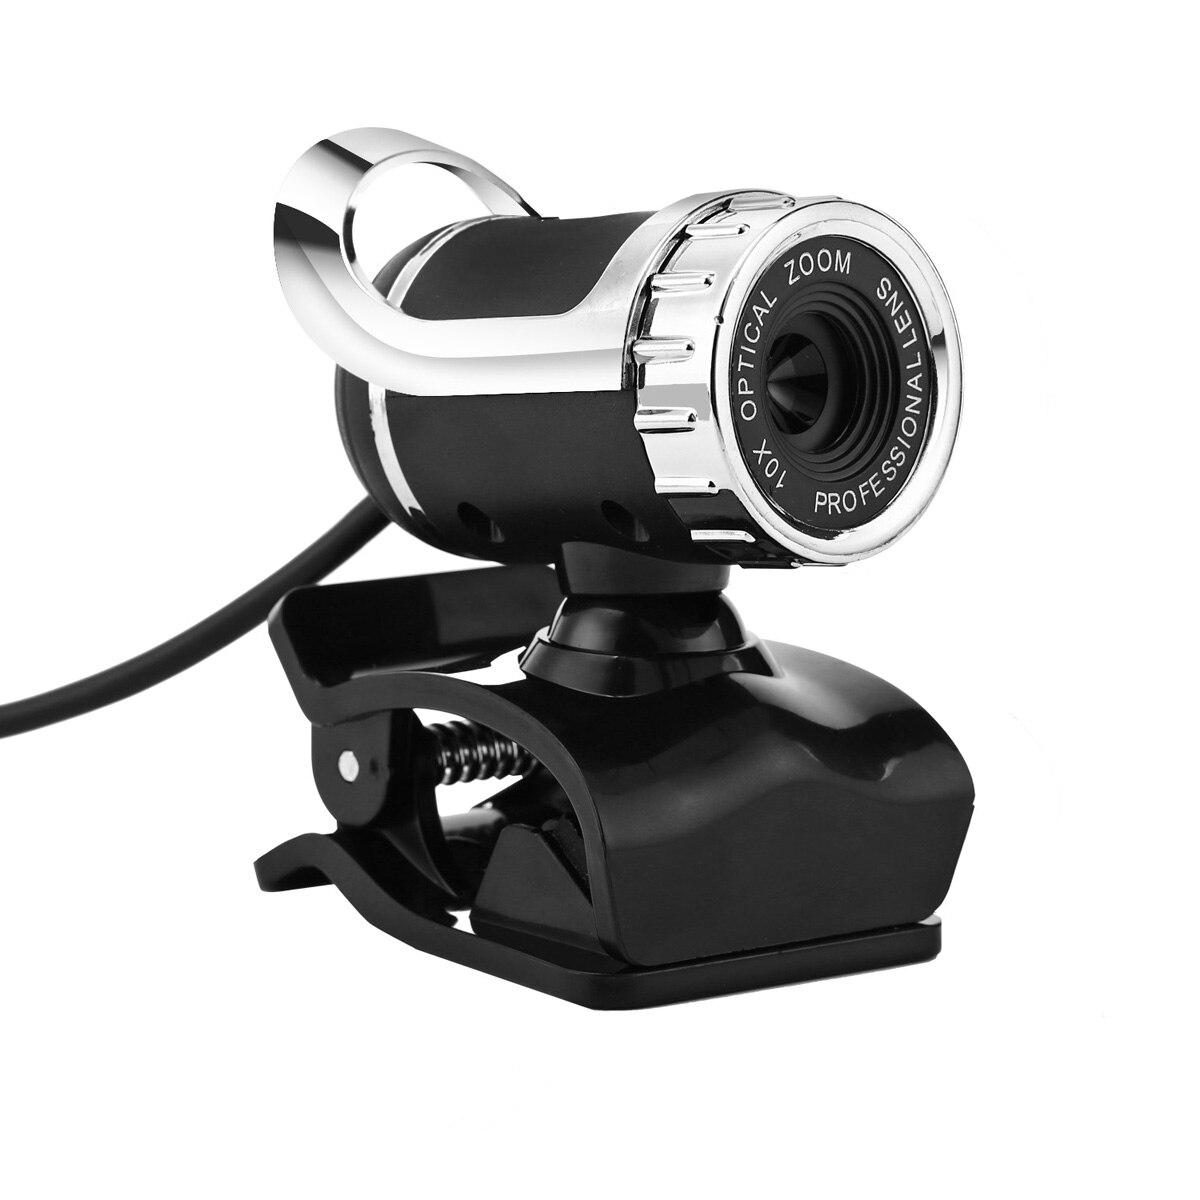 360 Degrees Rotatable Clip-on USB Webcam with Adjustable Focal Length Lens for Laptop/Desktop 2